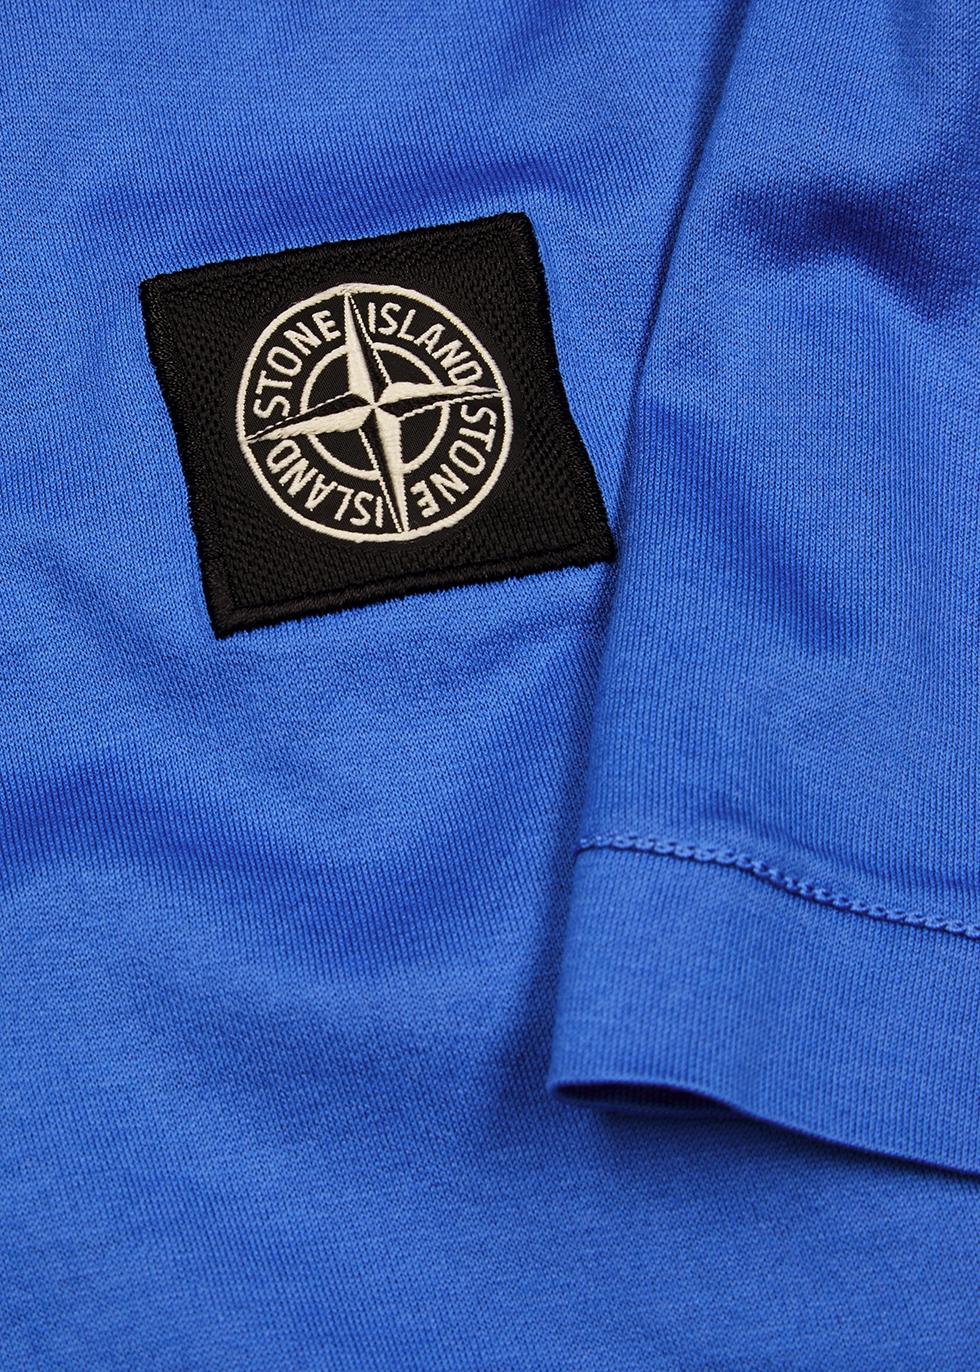 Blue cotton T-shirt - Stone Island